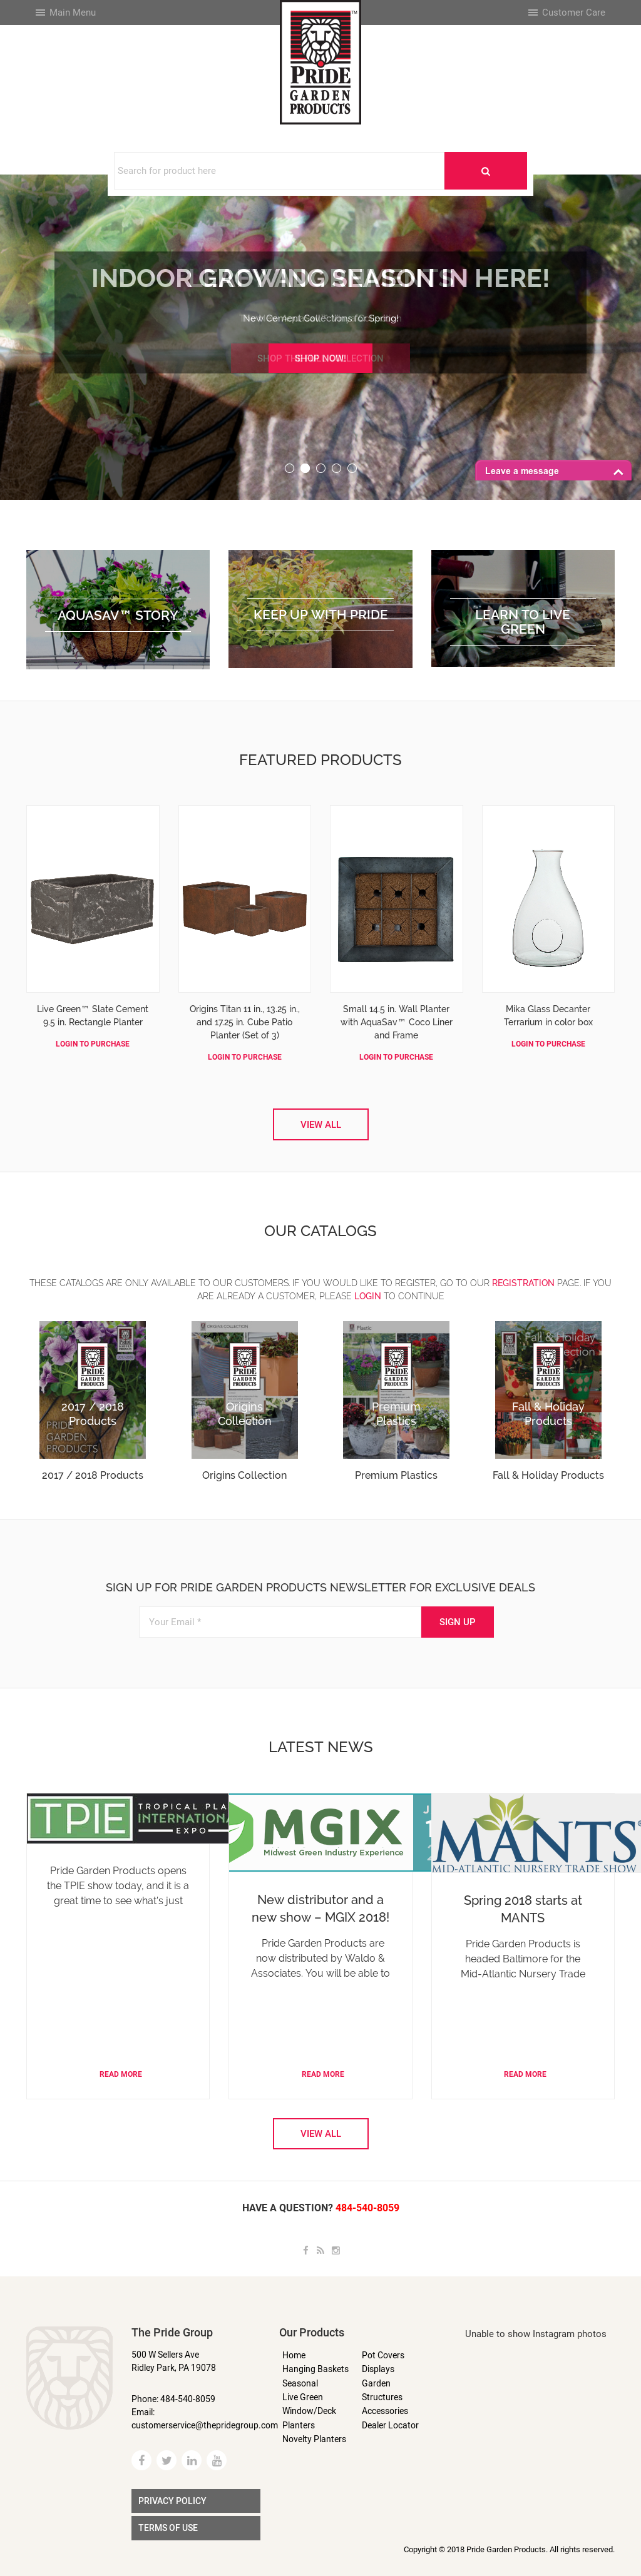 Pride Garden Products Website History